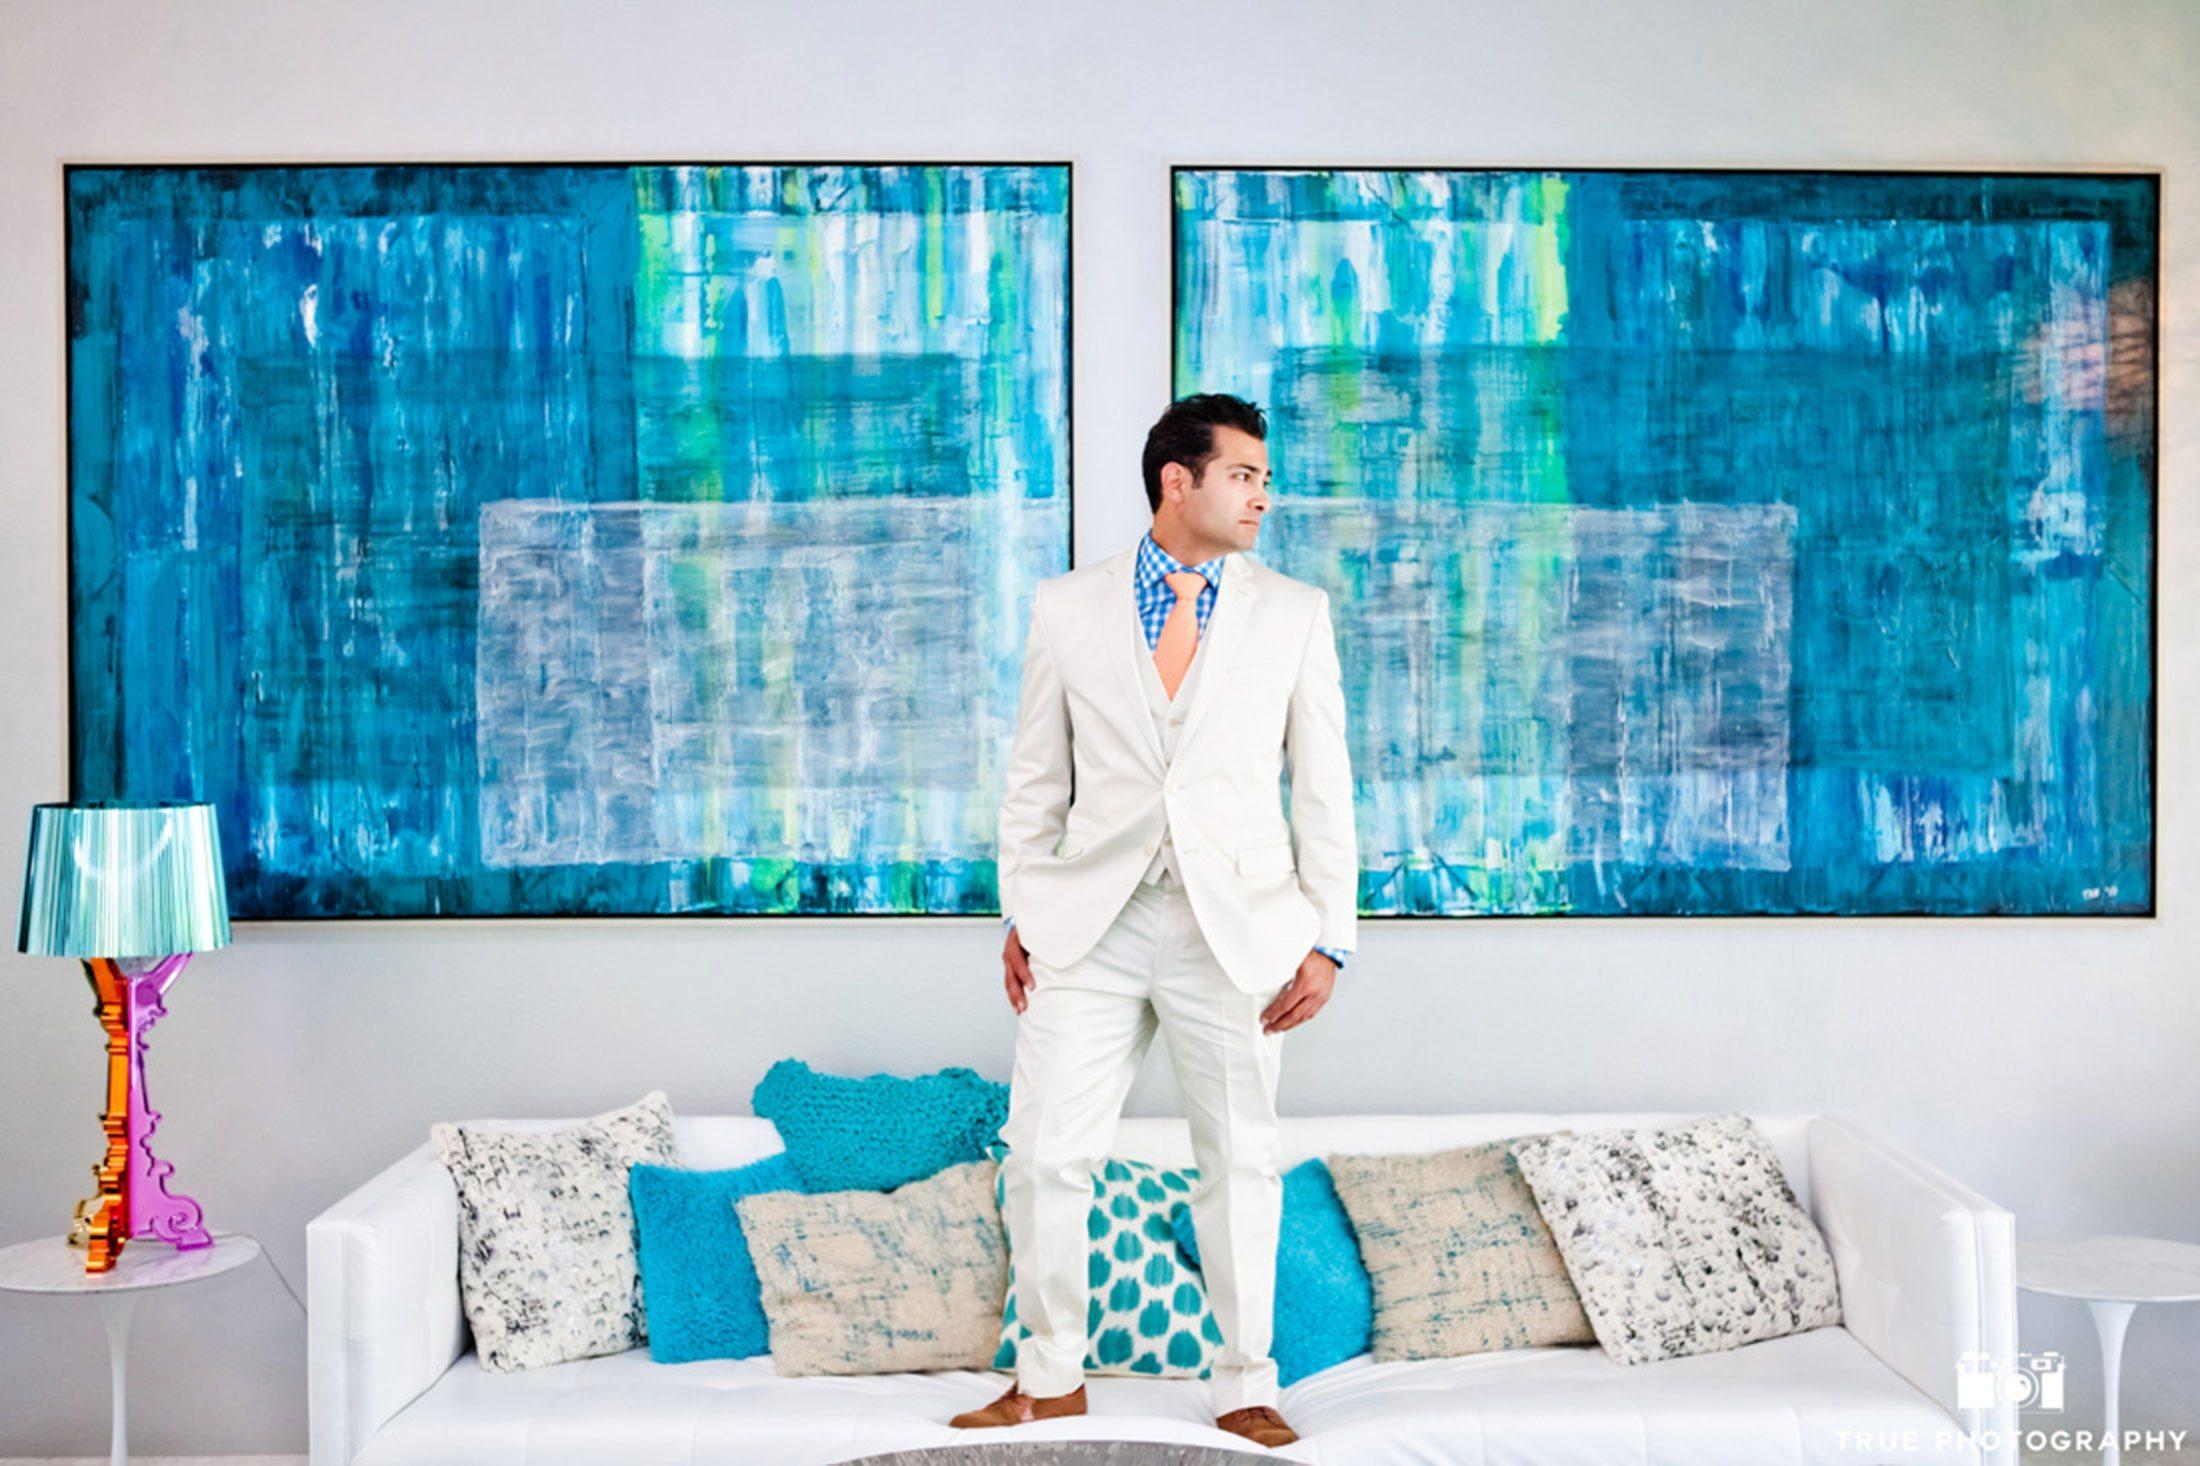 stylized portrait of groom wearing a white suit